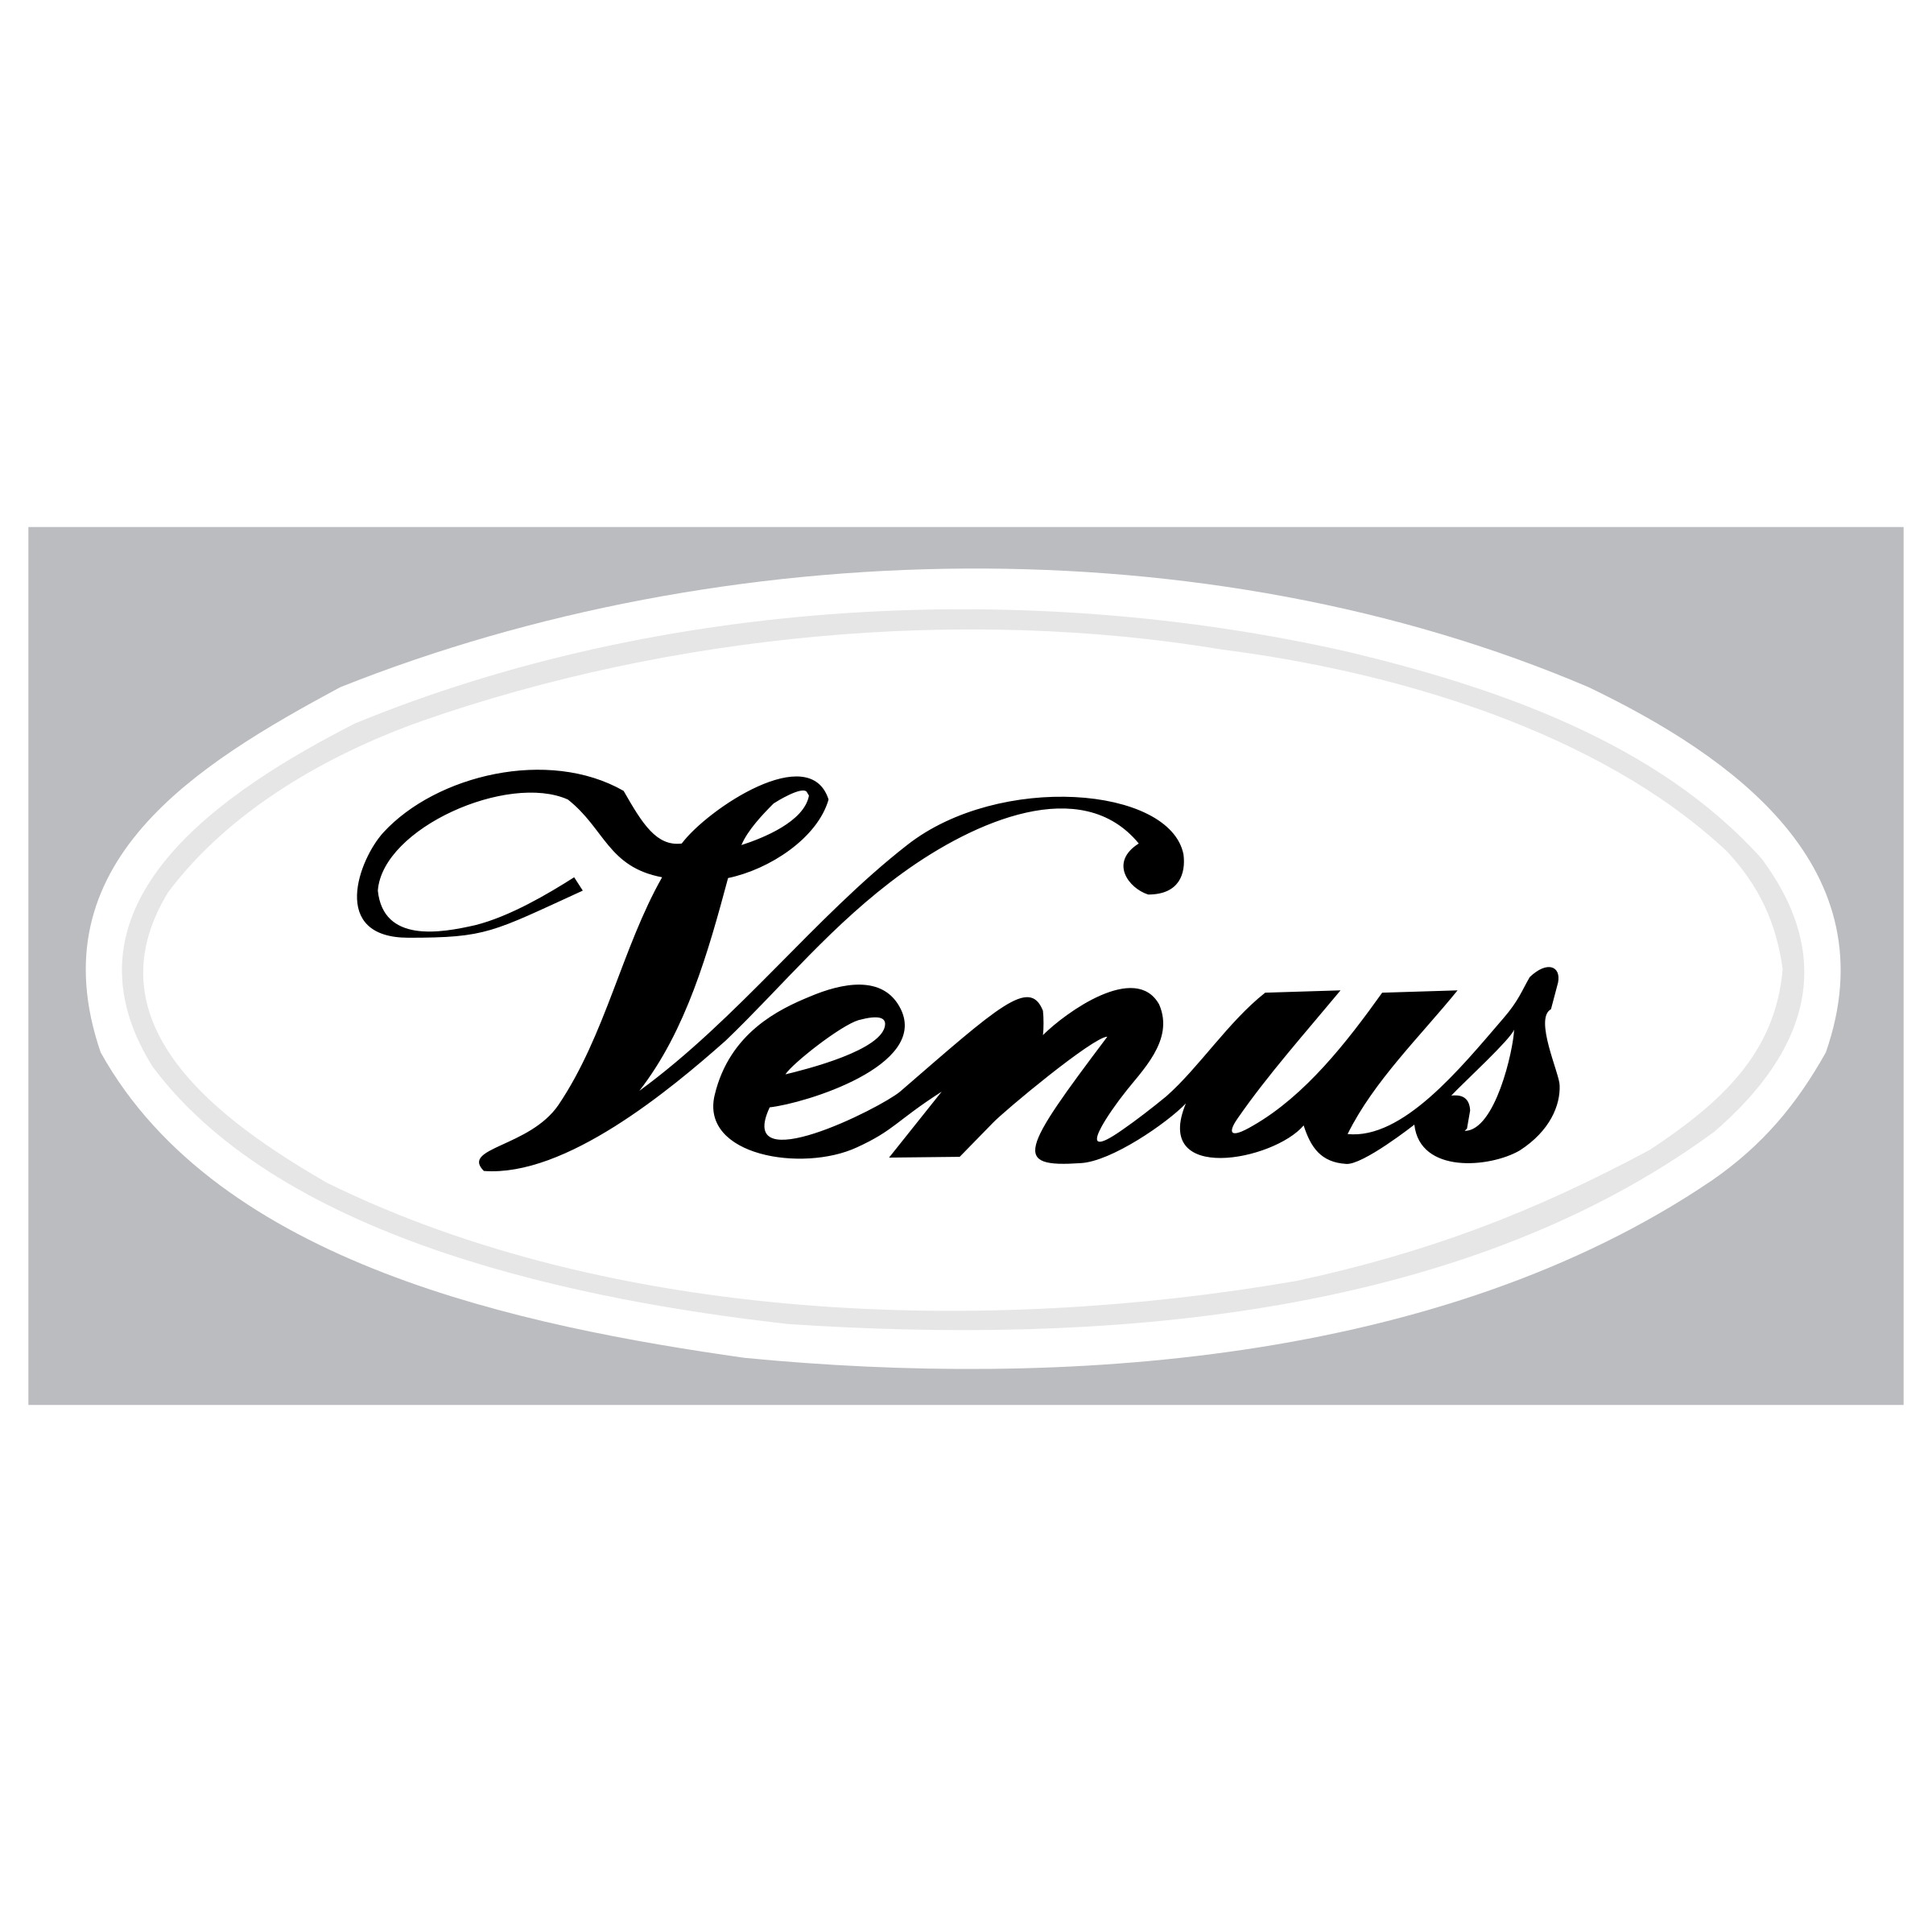 Venus Logo PNG Transparent & SVG Vector.